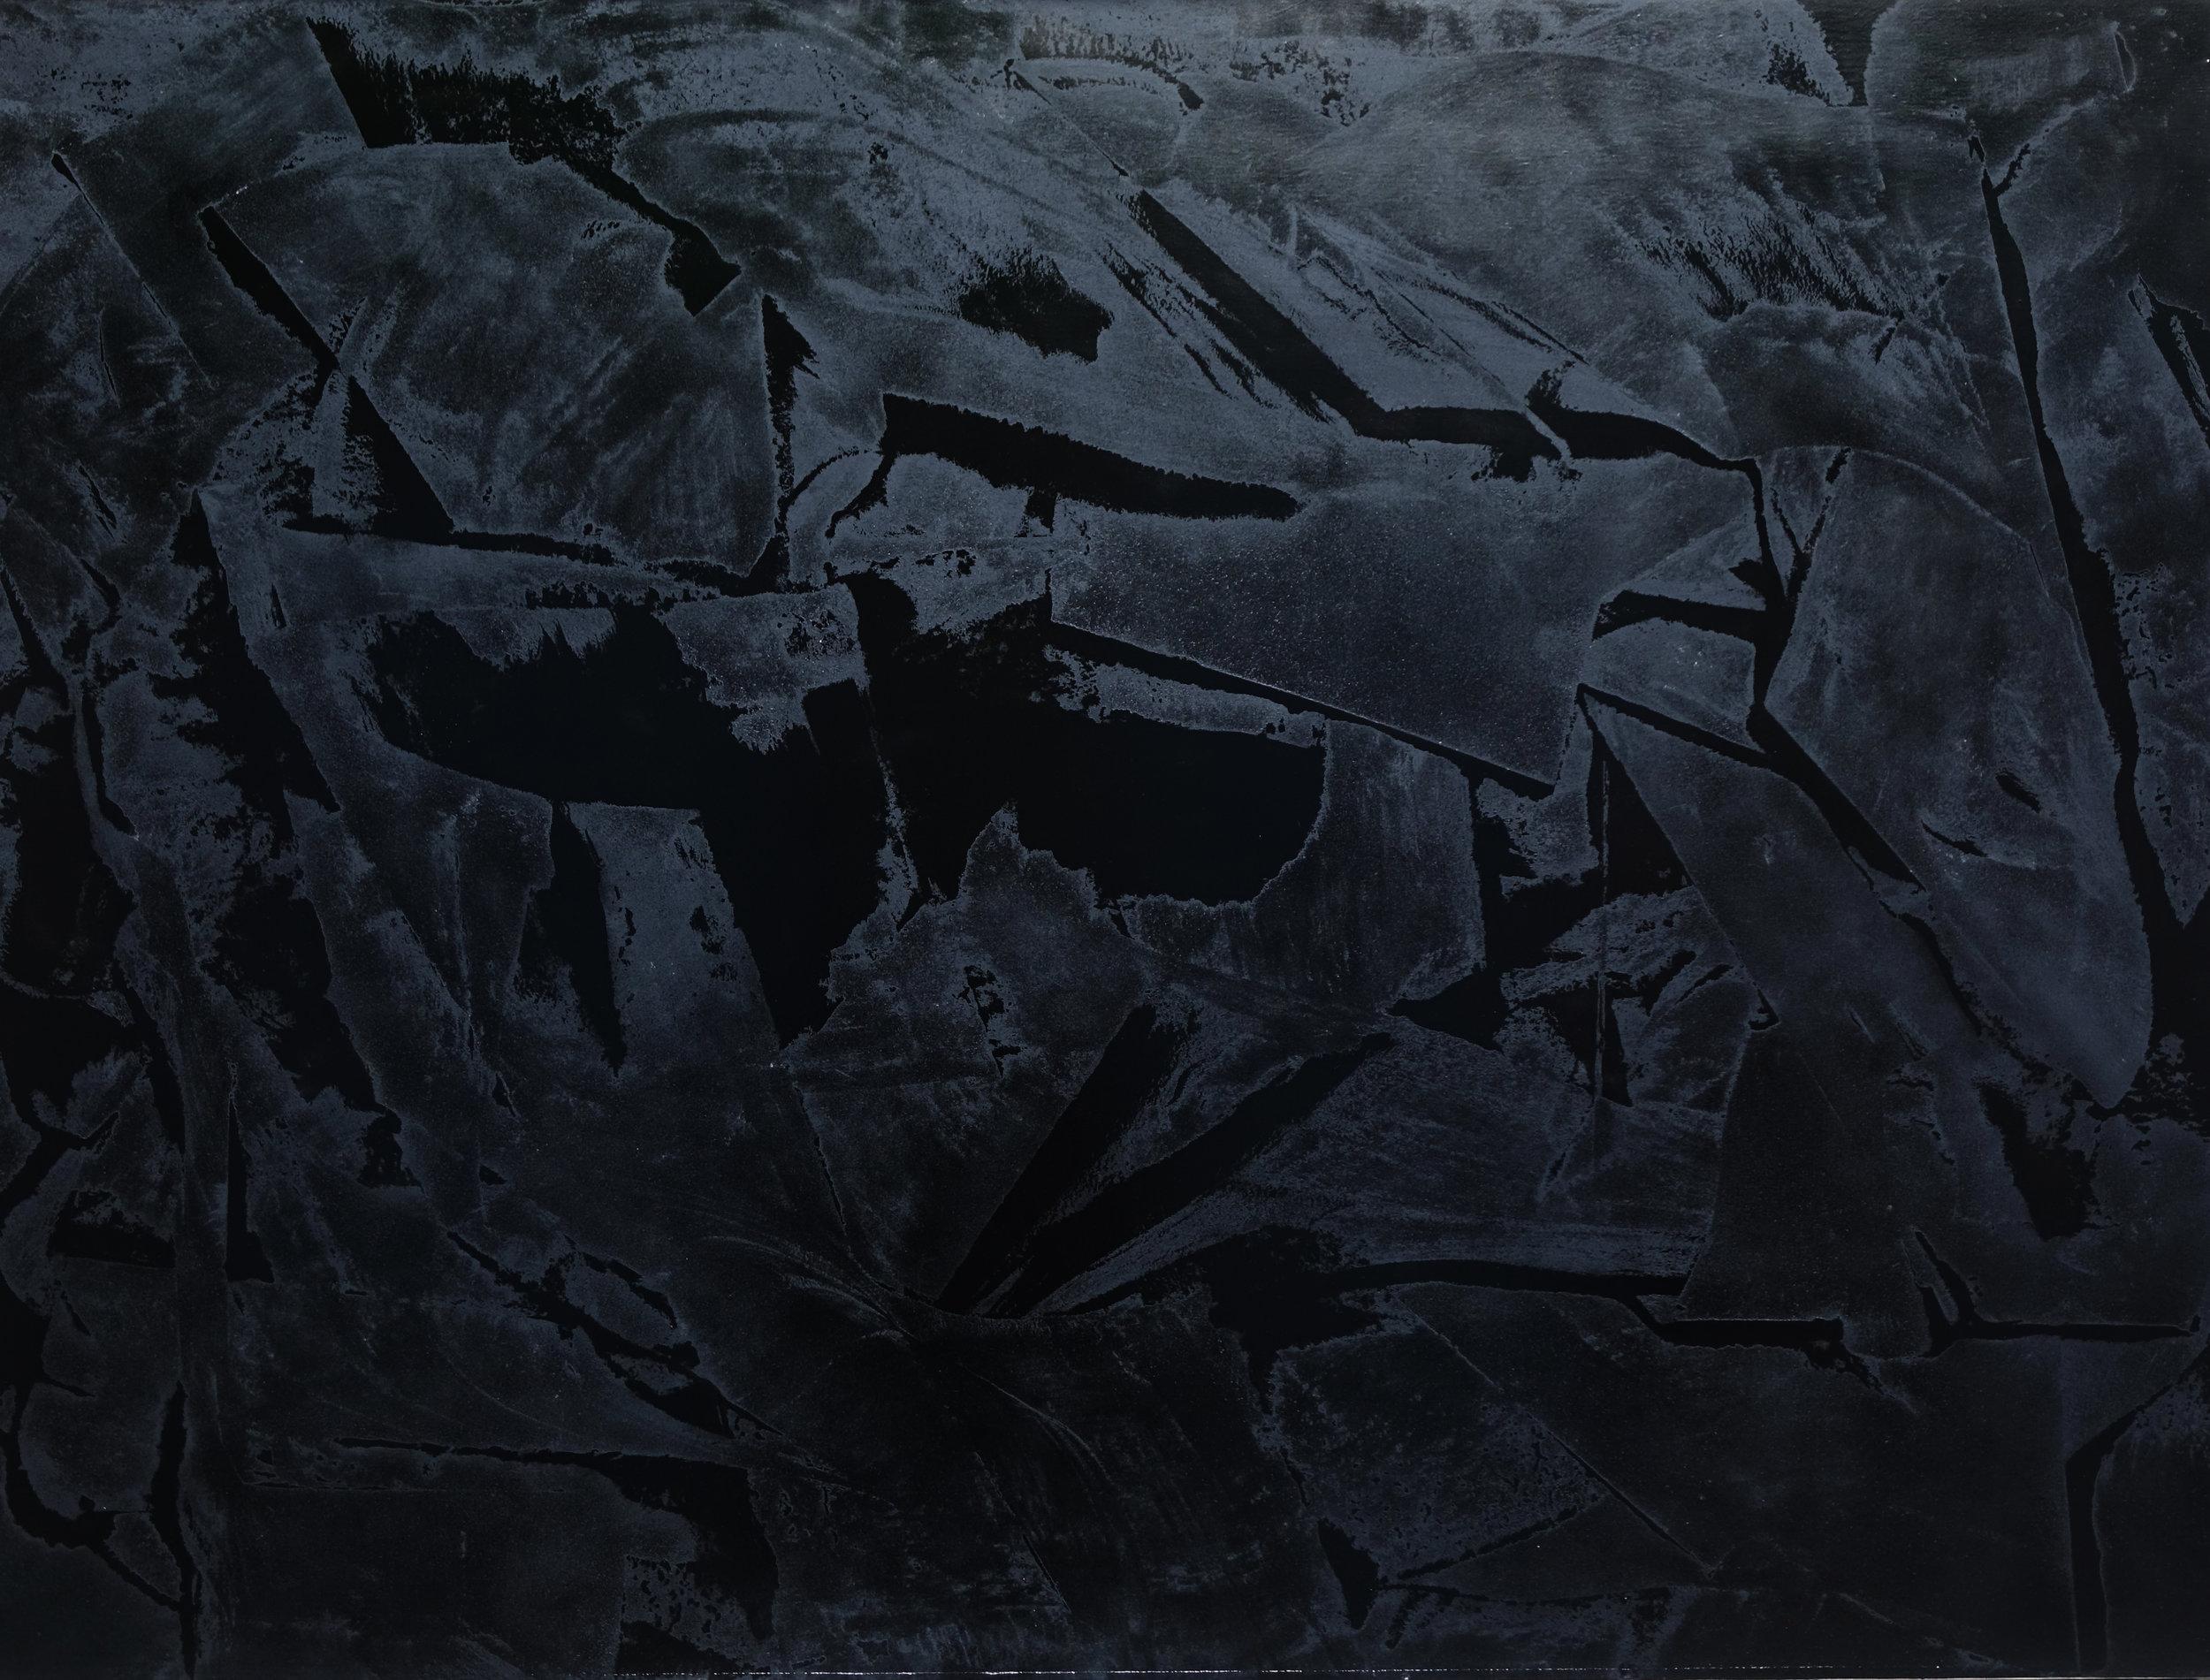 Black Void No. 15, 2017, 259cm x 194cm 200F, Oil on Canvas.jpg